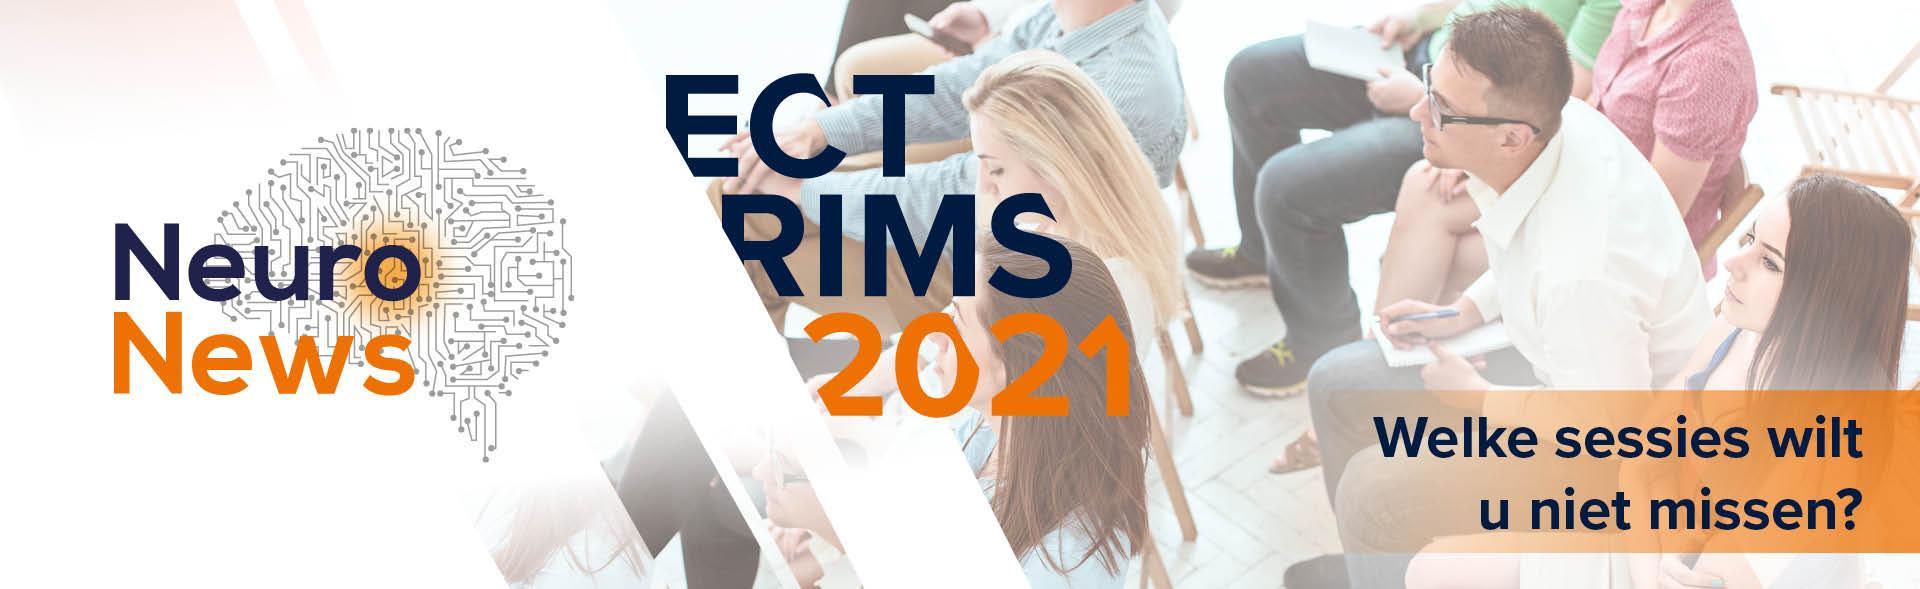 Ectrims 2021 banner